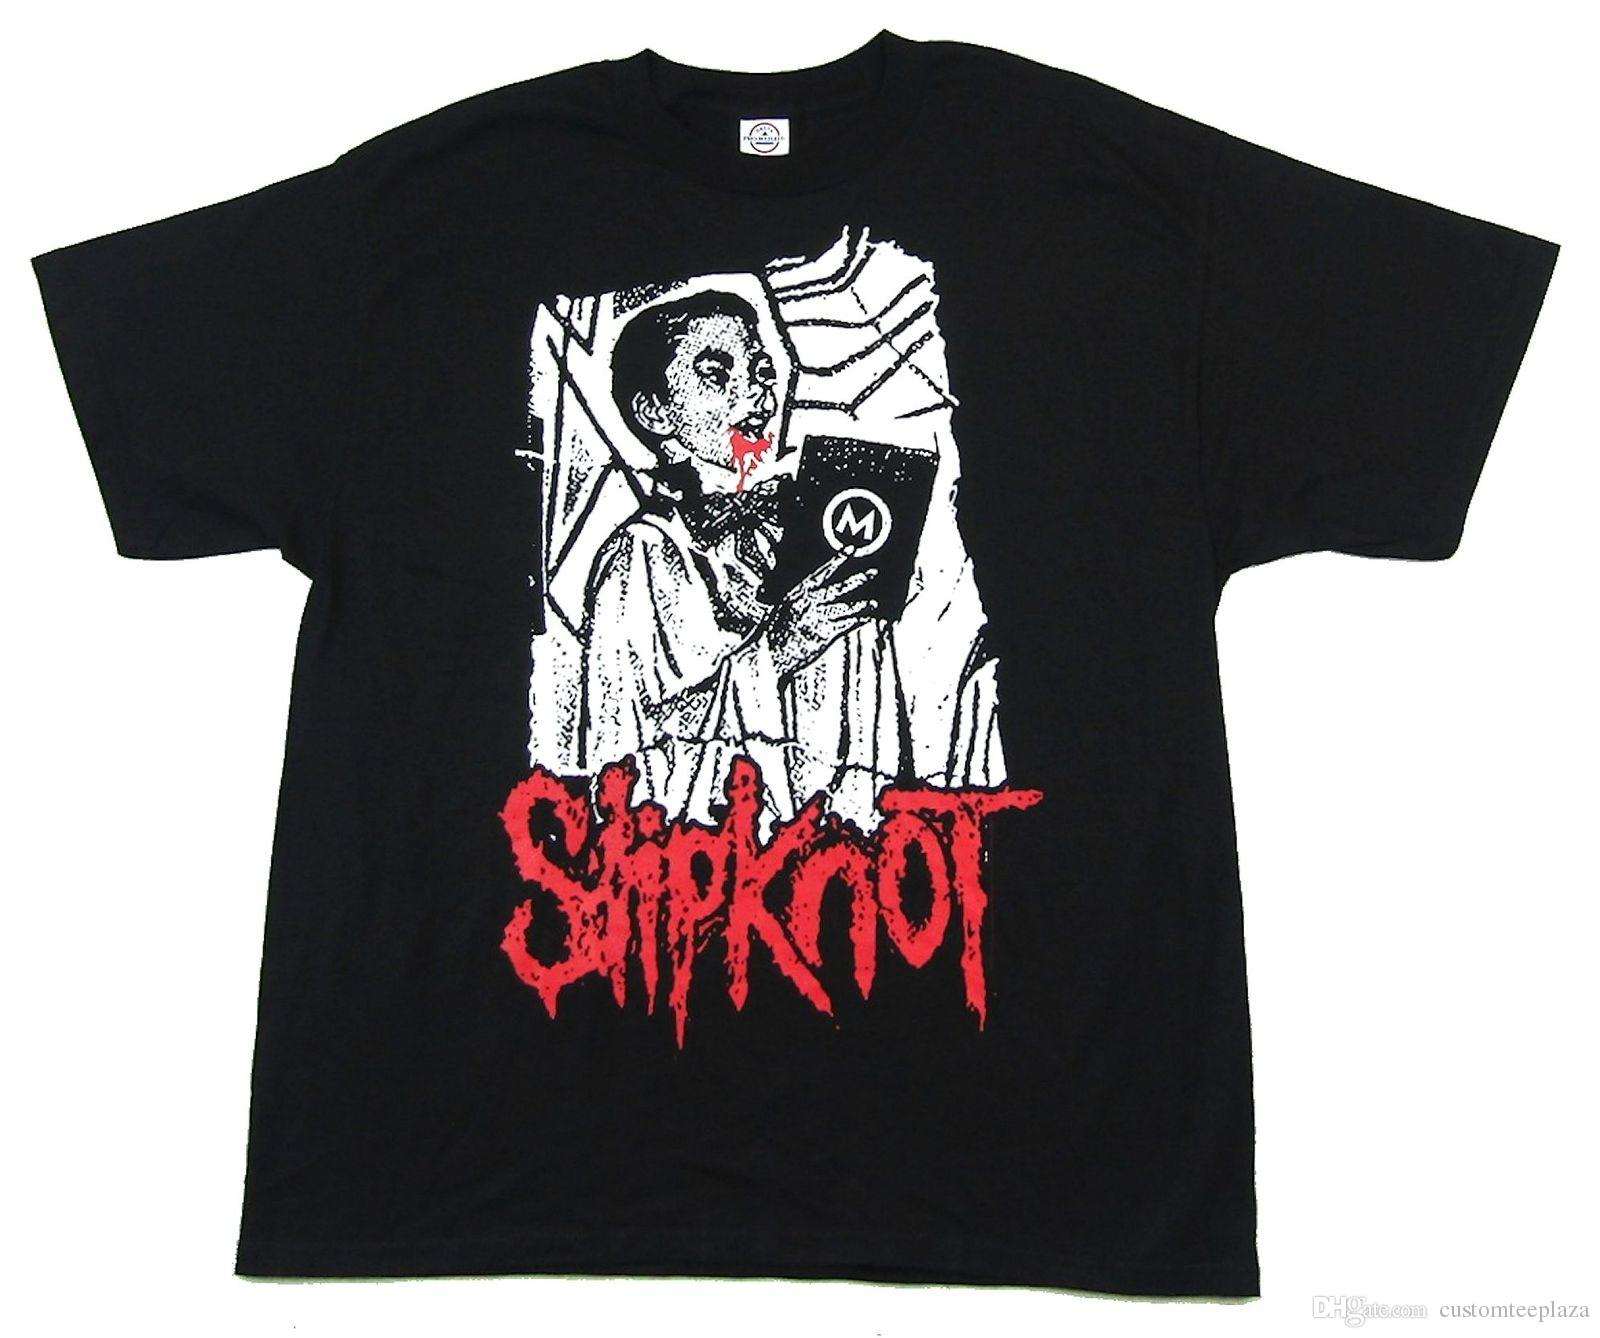 ca55d47f586 Slipknot Altar Boy Black T Shirt New Official Band Merch Tee Shirt Men Man  s Top Design Custom Short Sleeve Plus Size T-Shirts